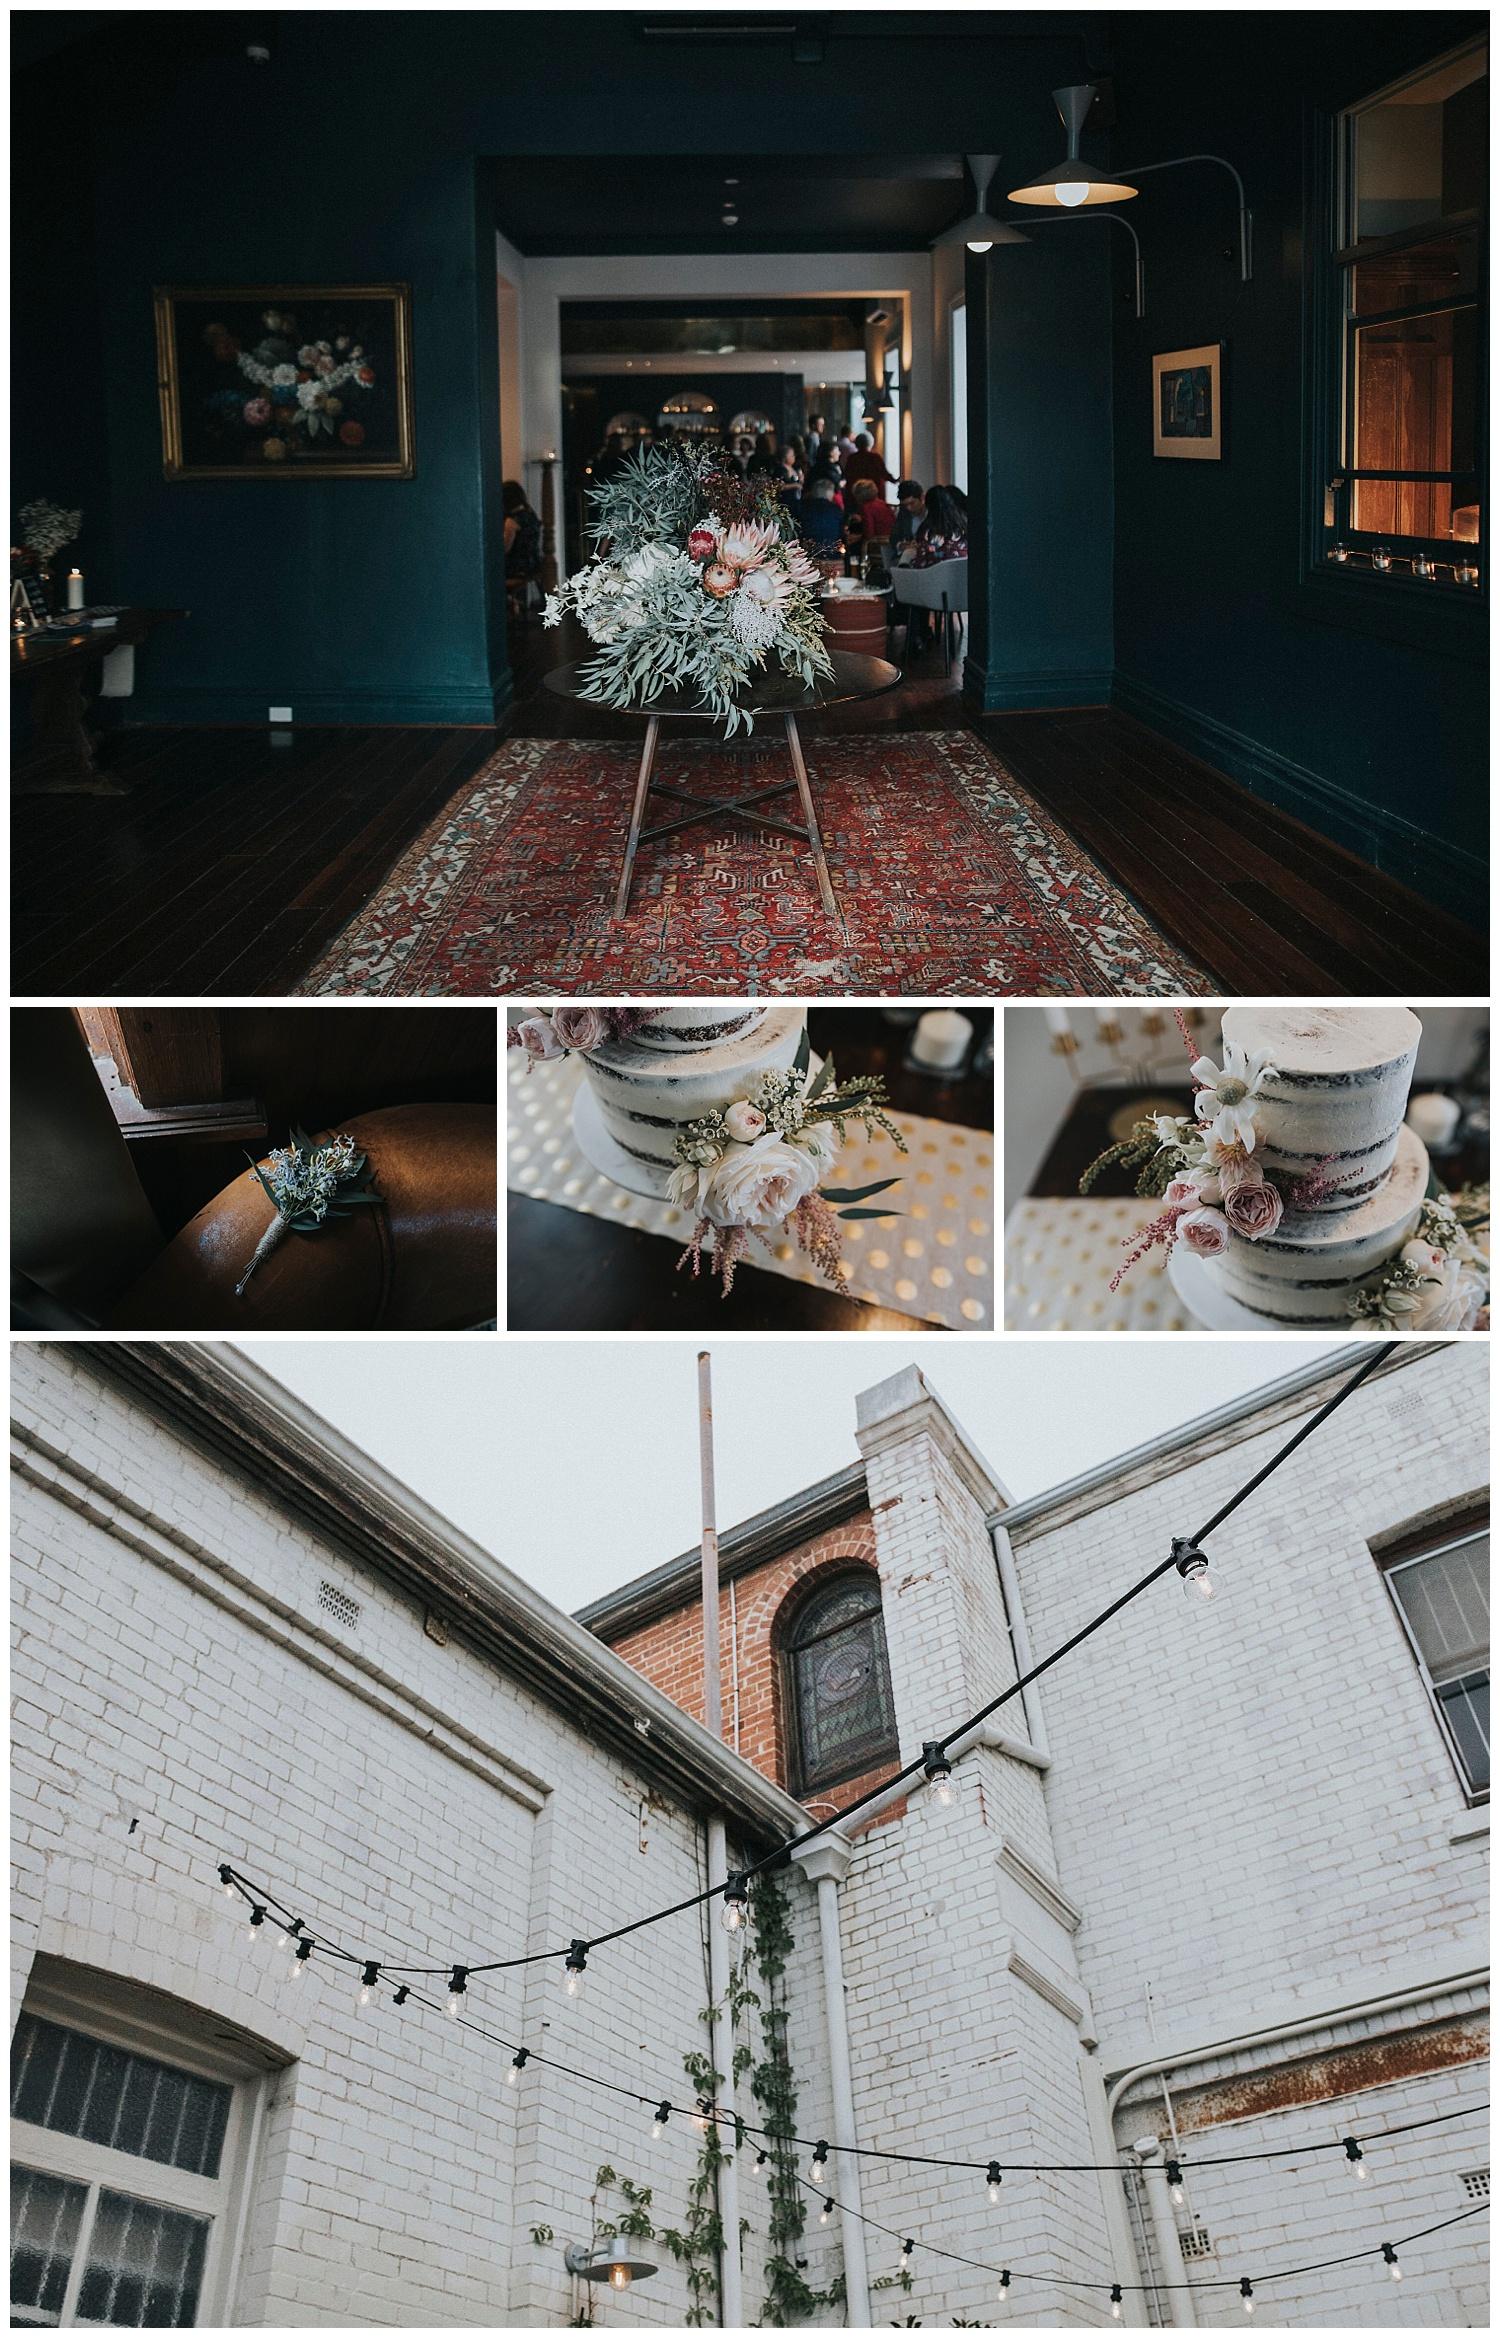 guildhall_wedding_keeper_creative_03.JPG